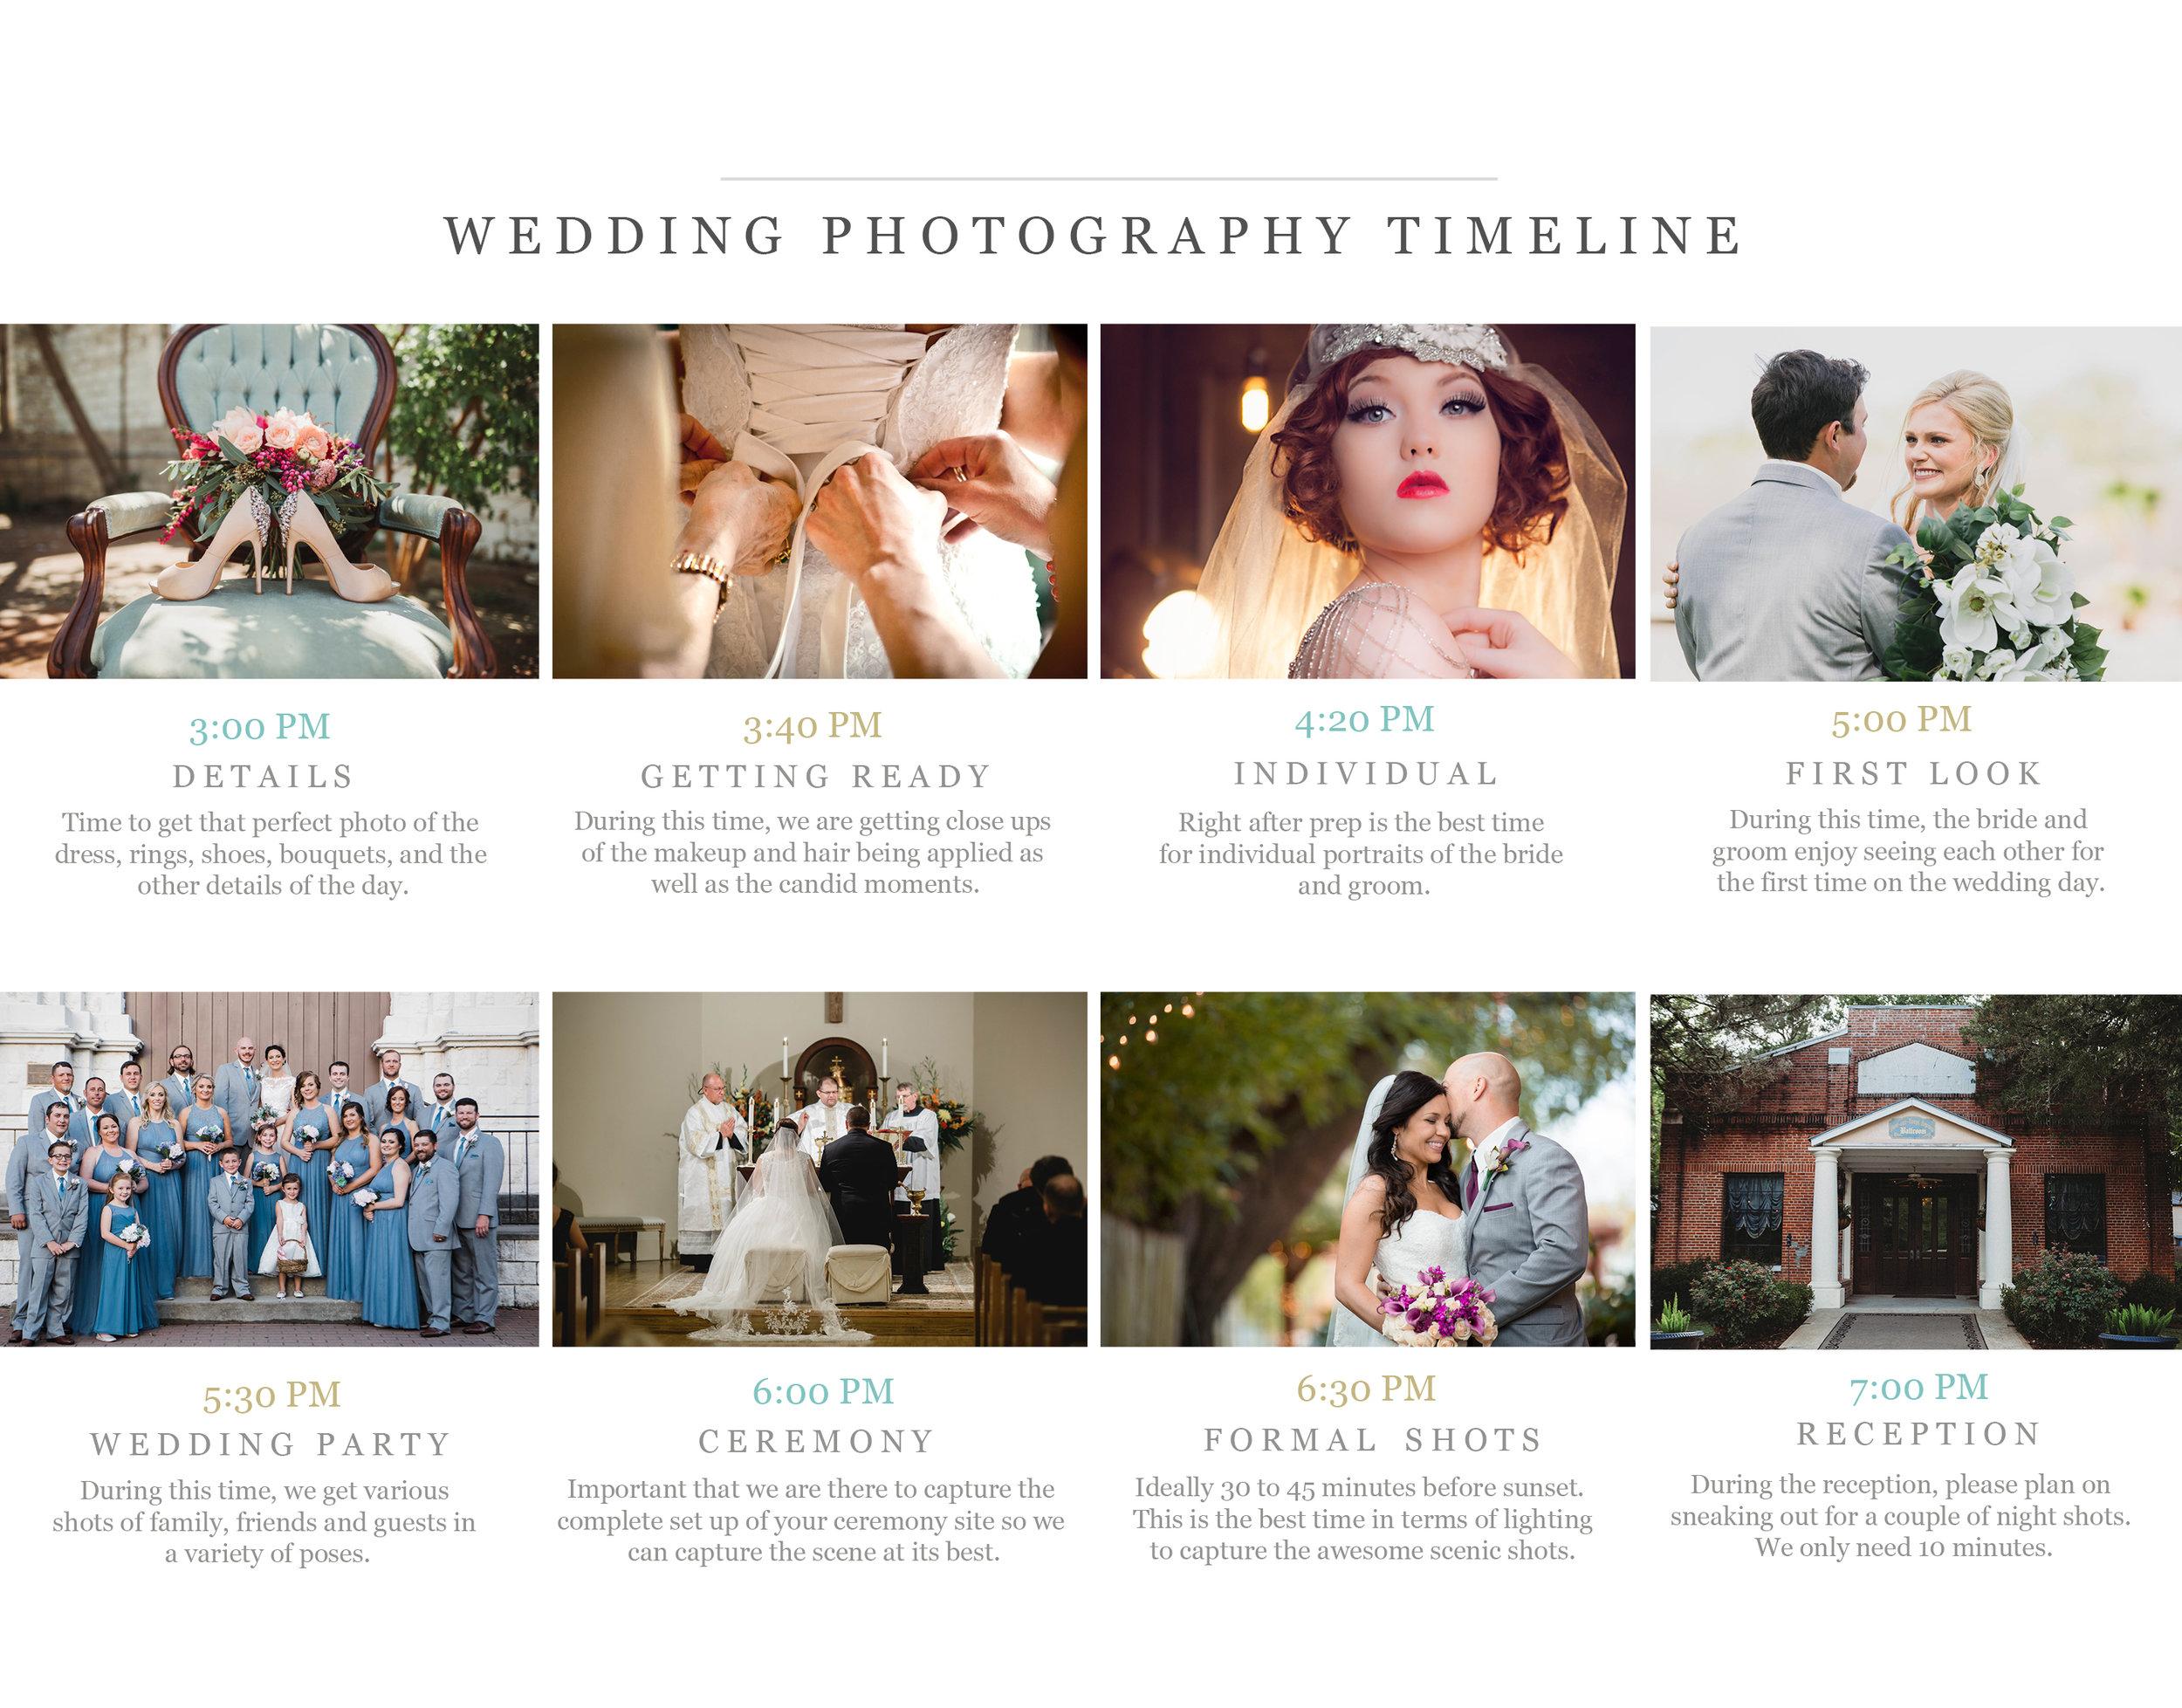 WeddingPhotographyTimeline-8x11.jpg